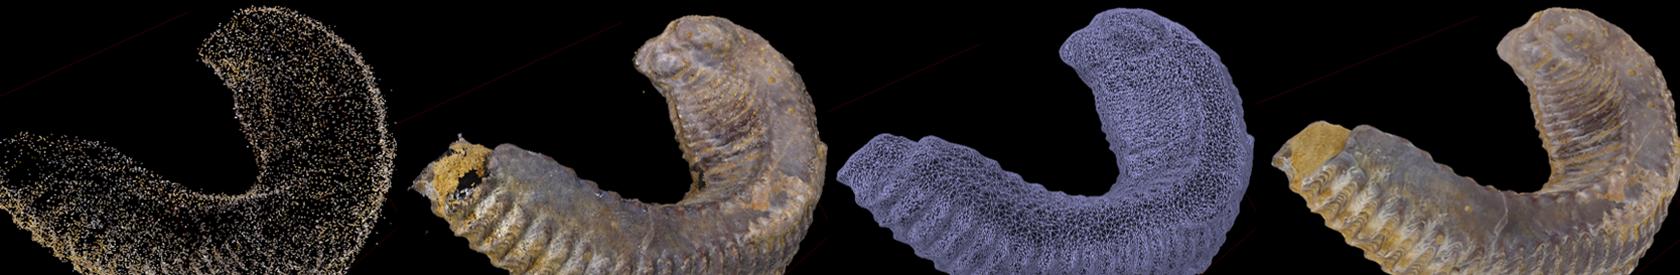 Fósiles 3D mediante técnicas de fotogrametría